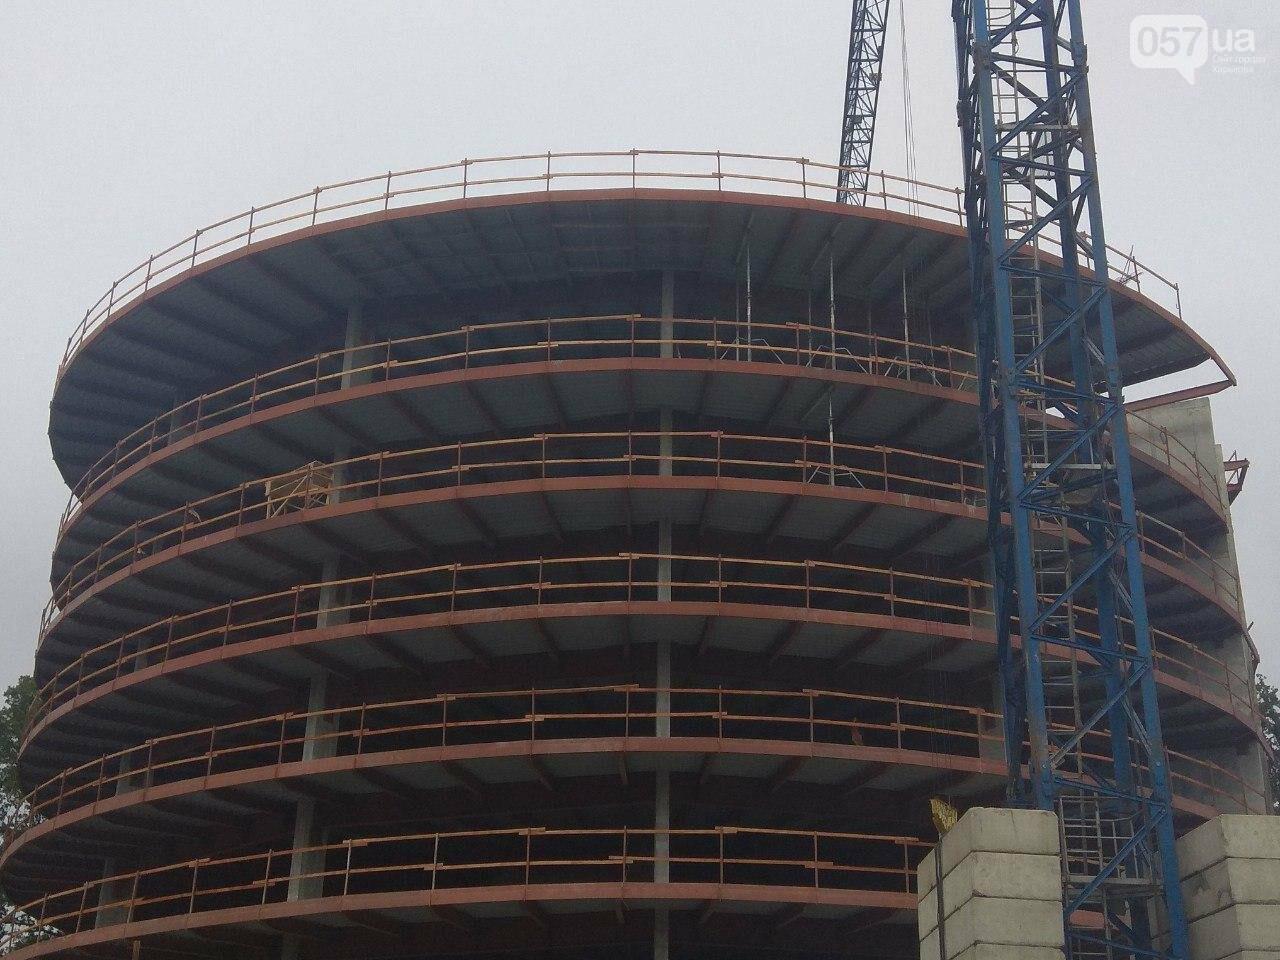 Фирма харьковского экс-нардепа строит многоуровневый паркинг за ХНАТОБом, - ФОТО, фото-3